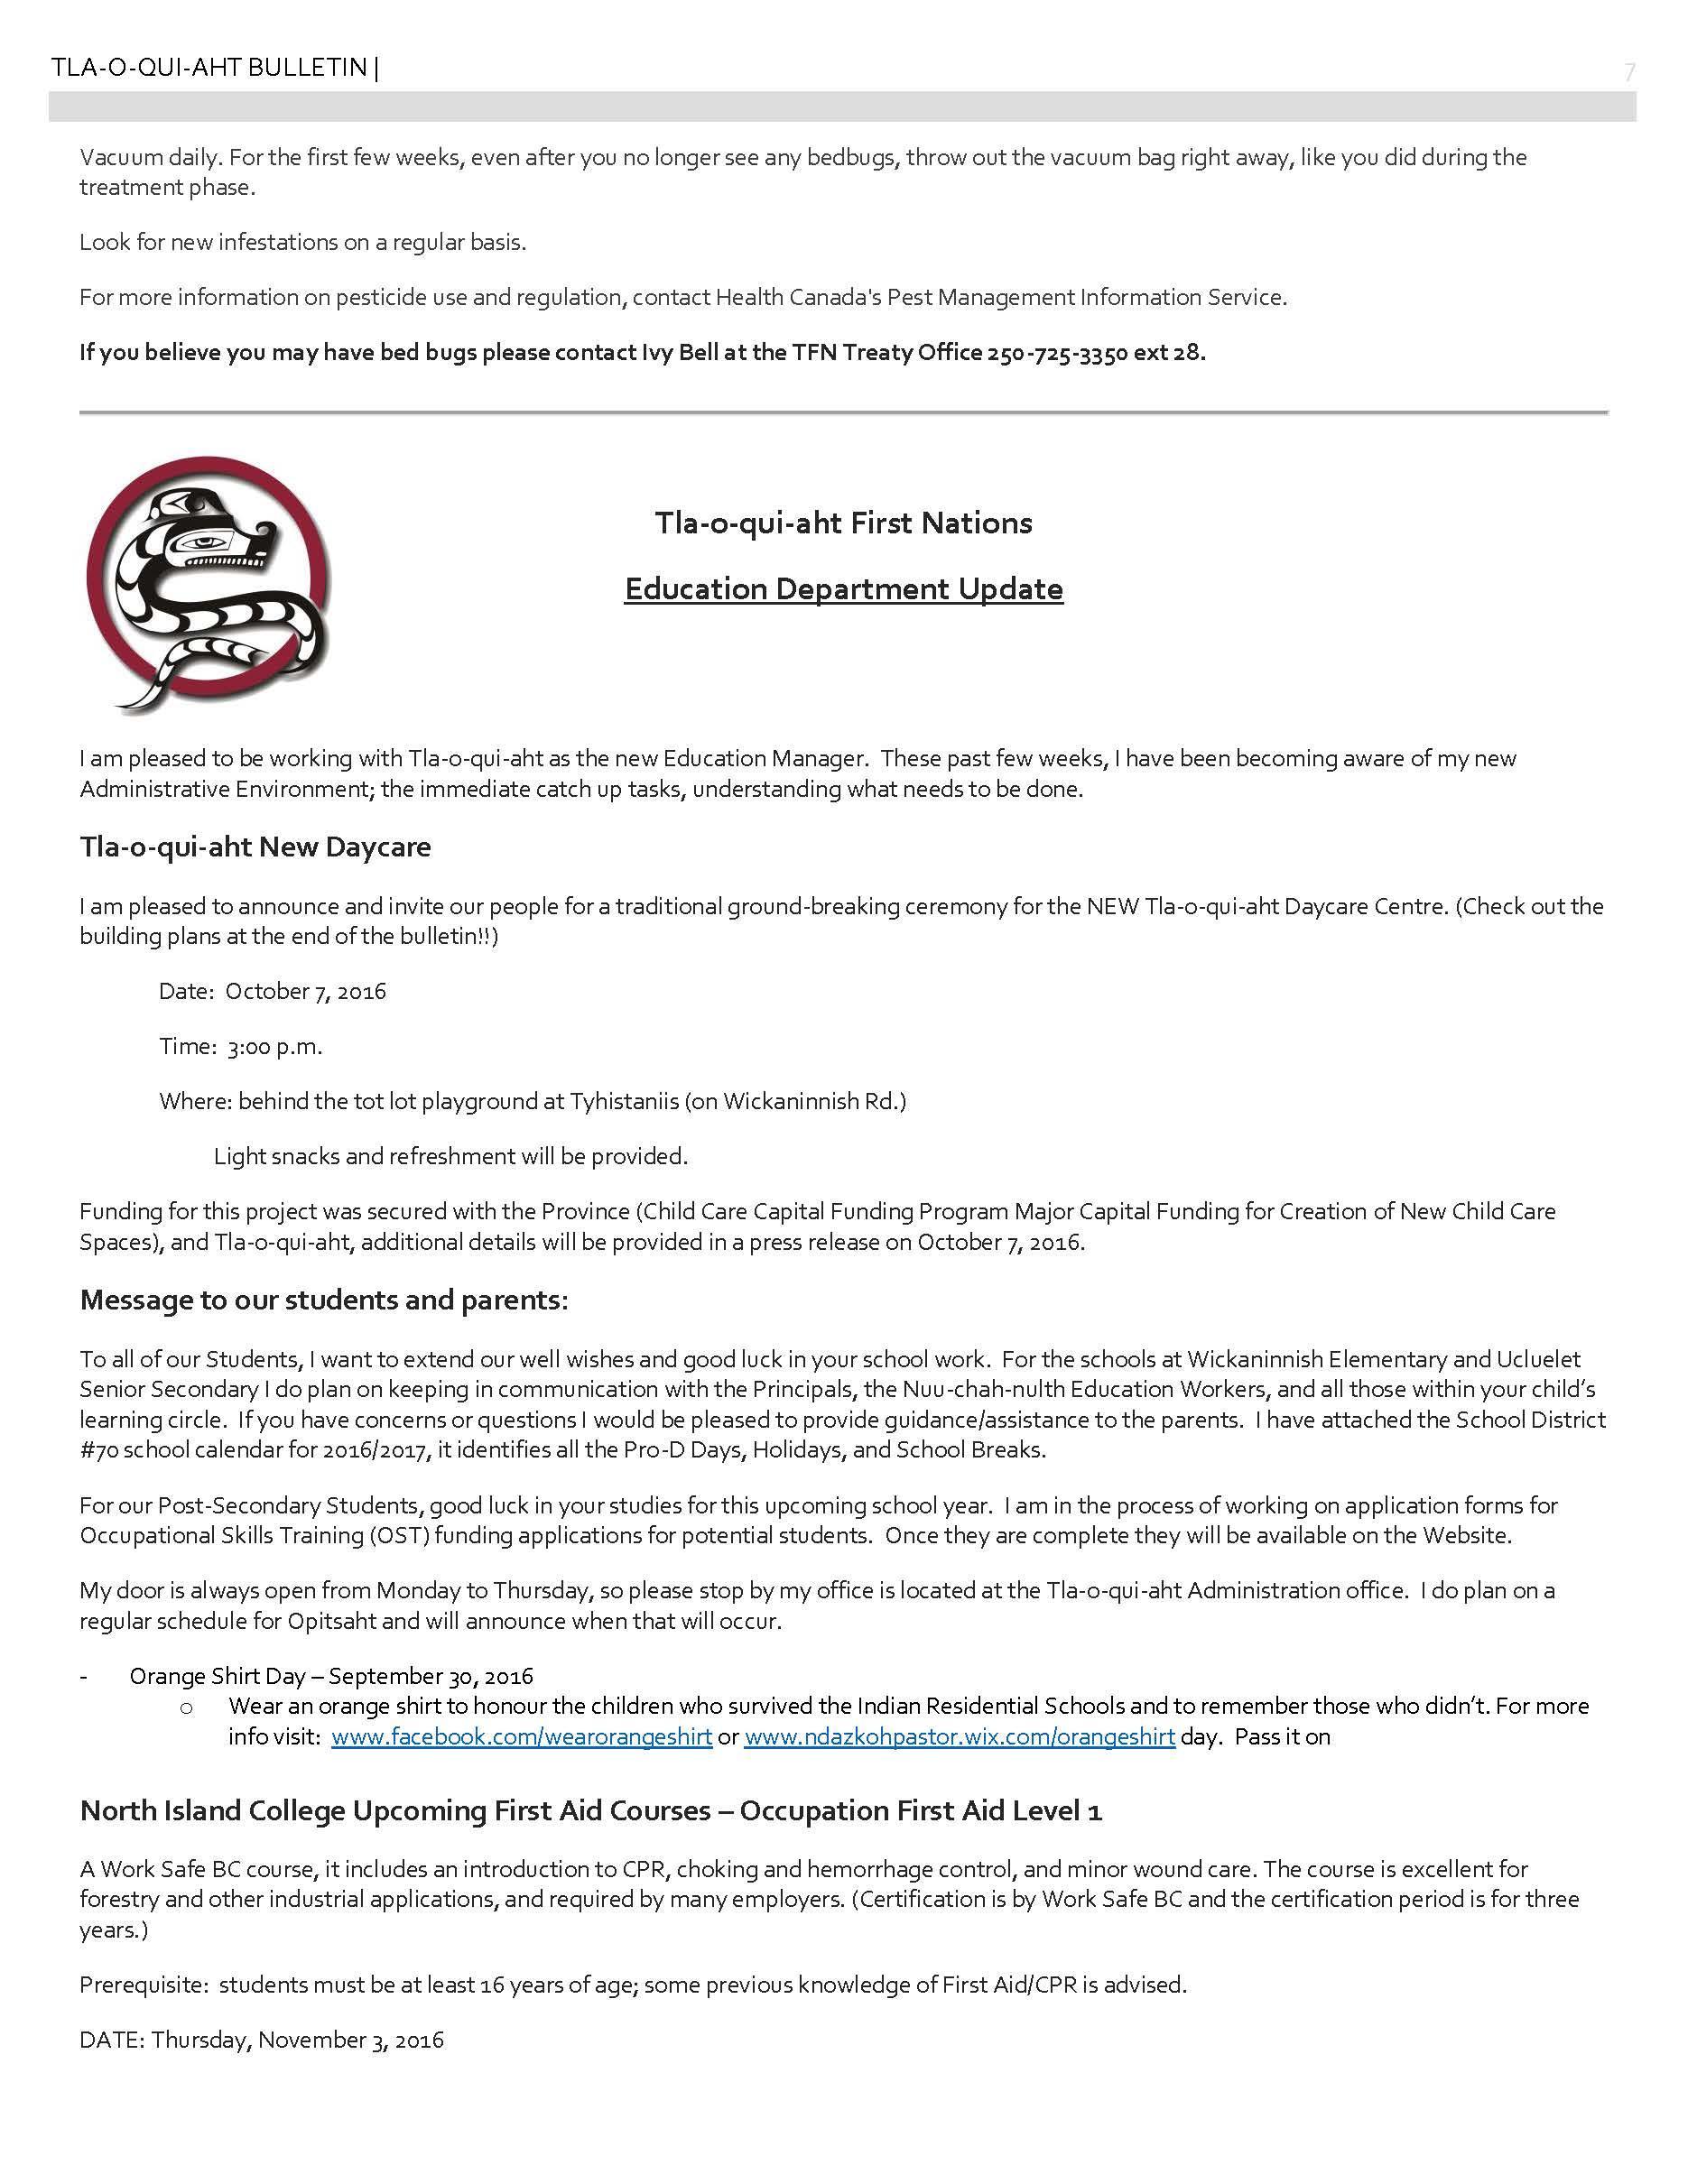 TFN Bulletin Sept 19-2016_Page_07.jpg